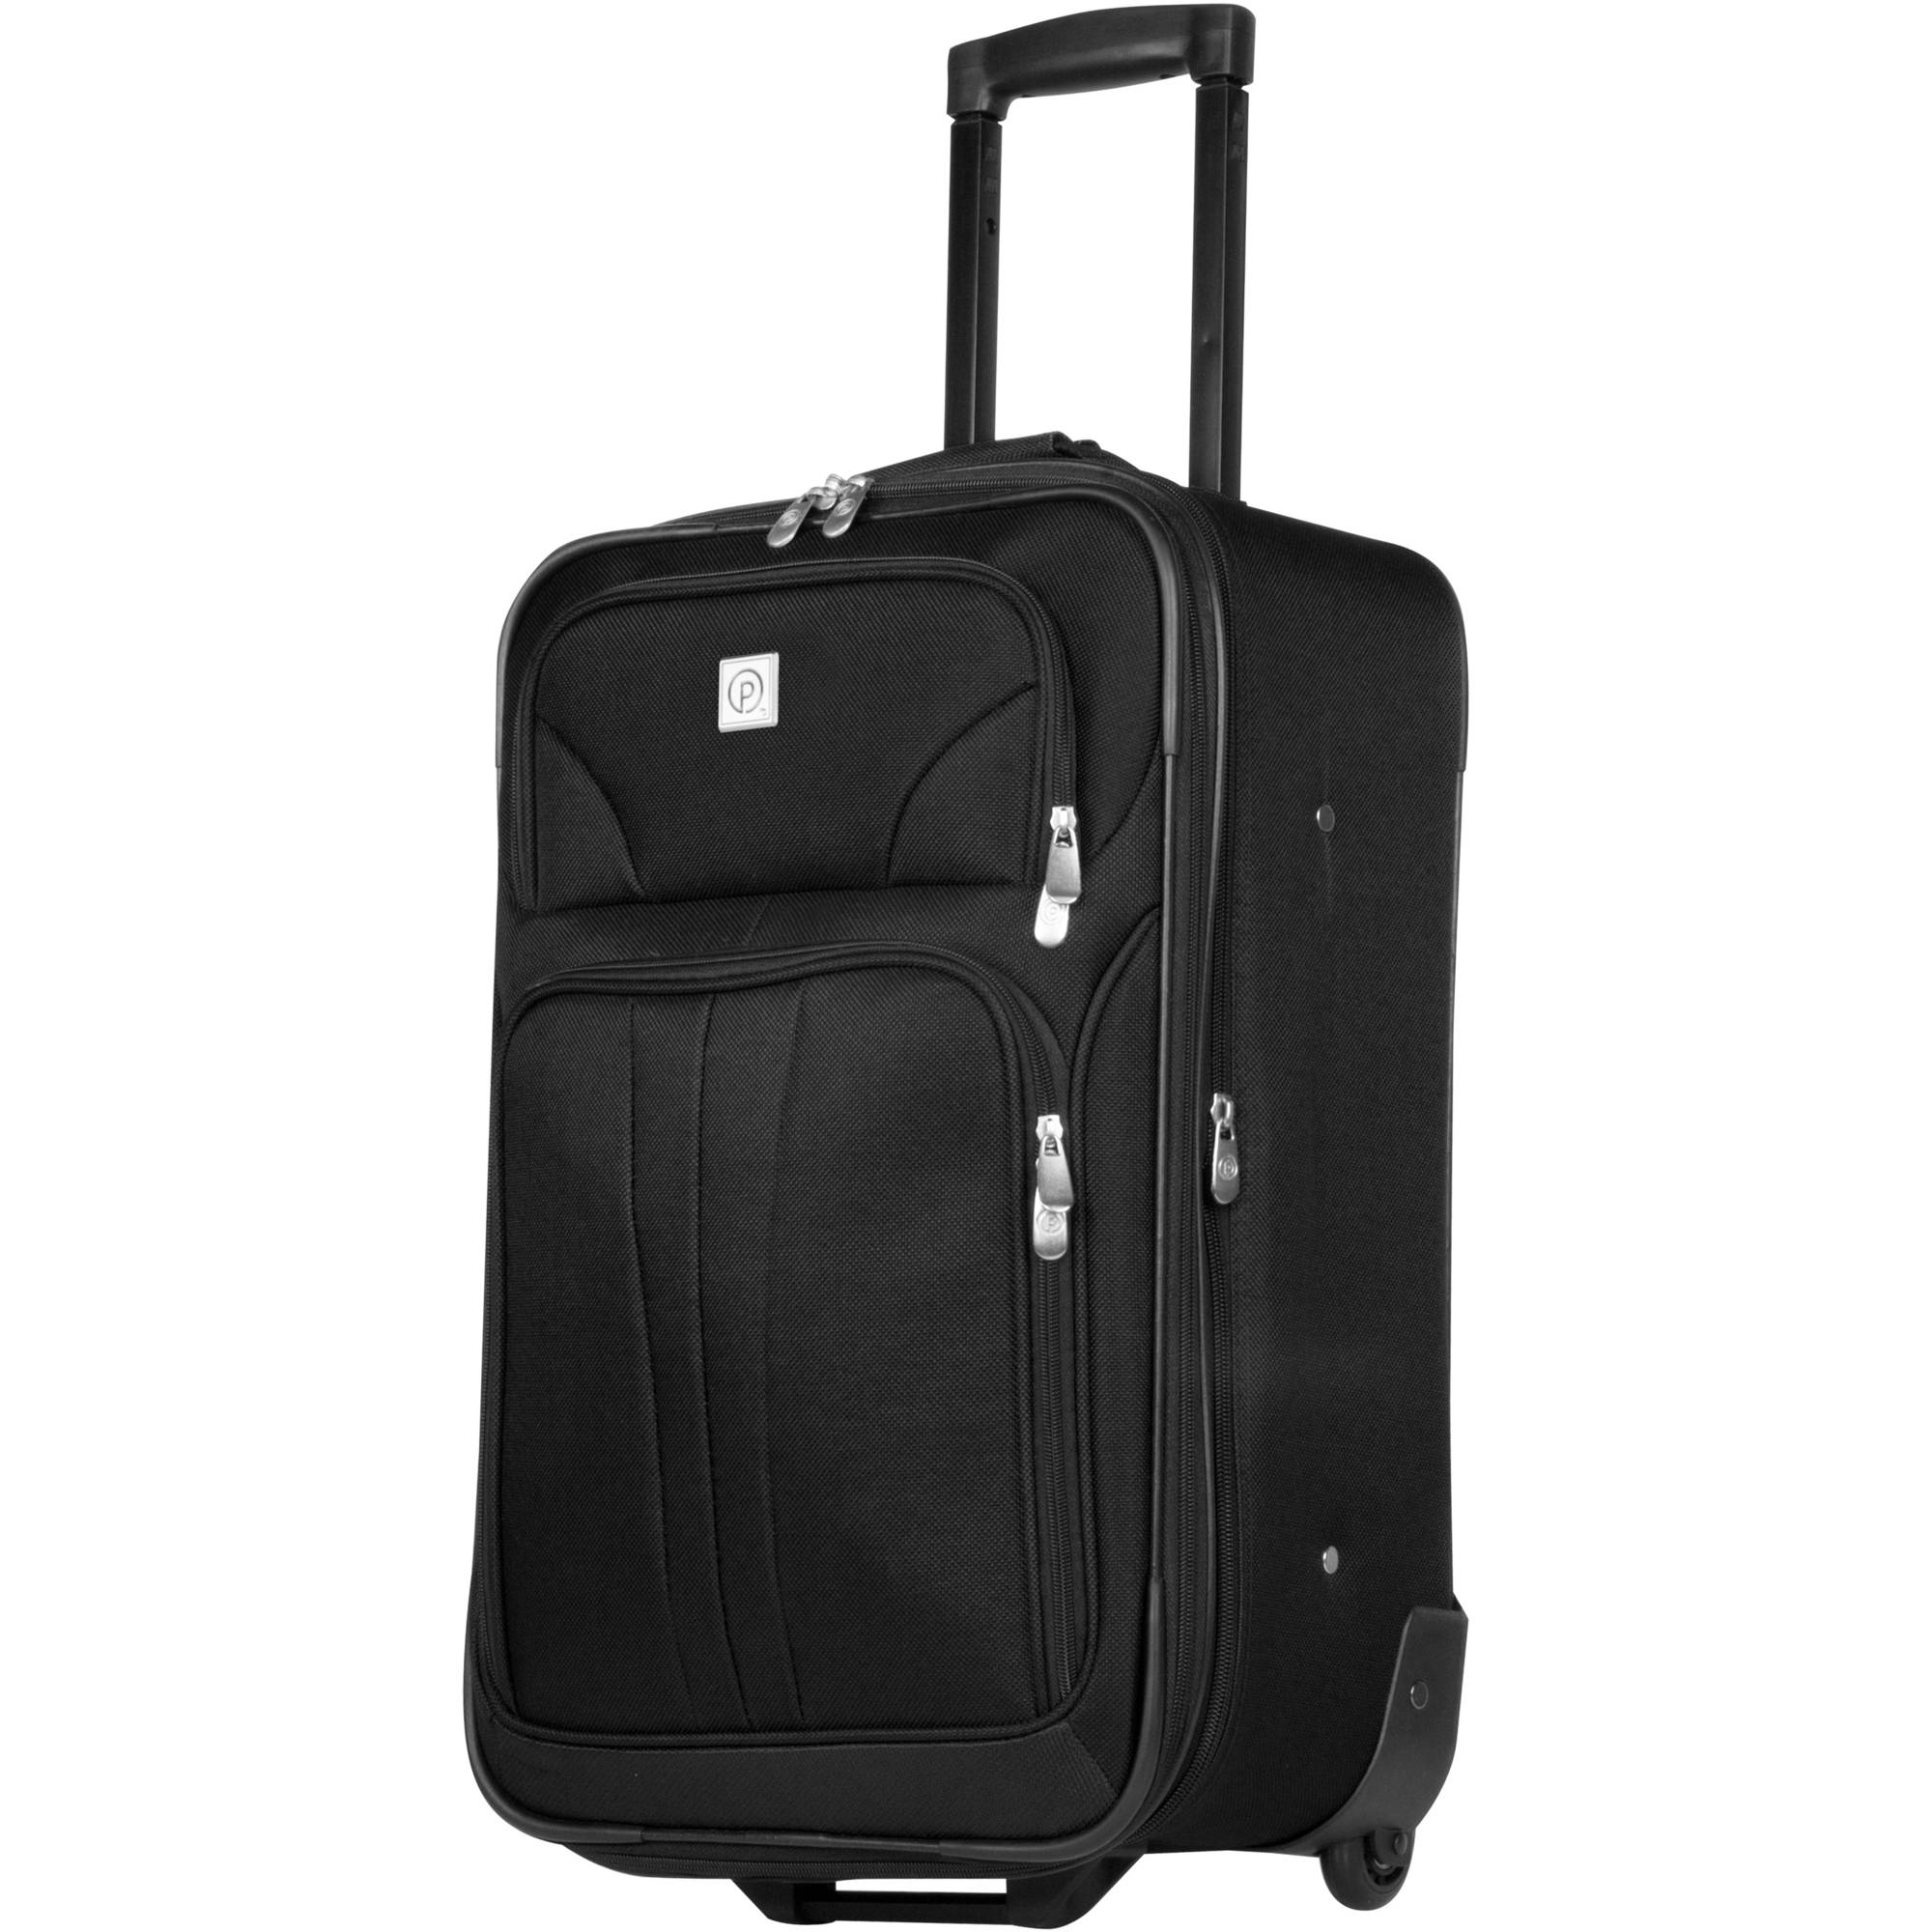 Rolling Luggage - Walmart.com